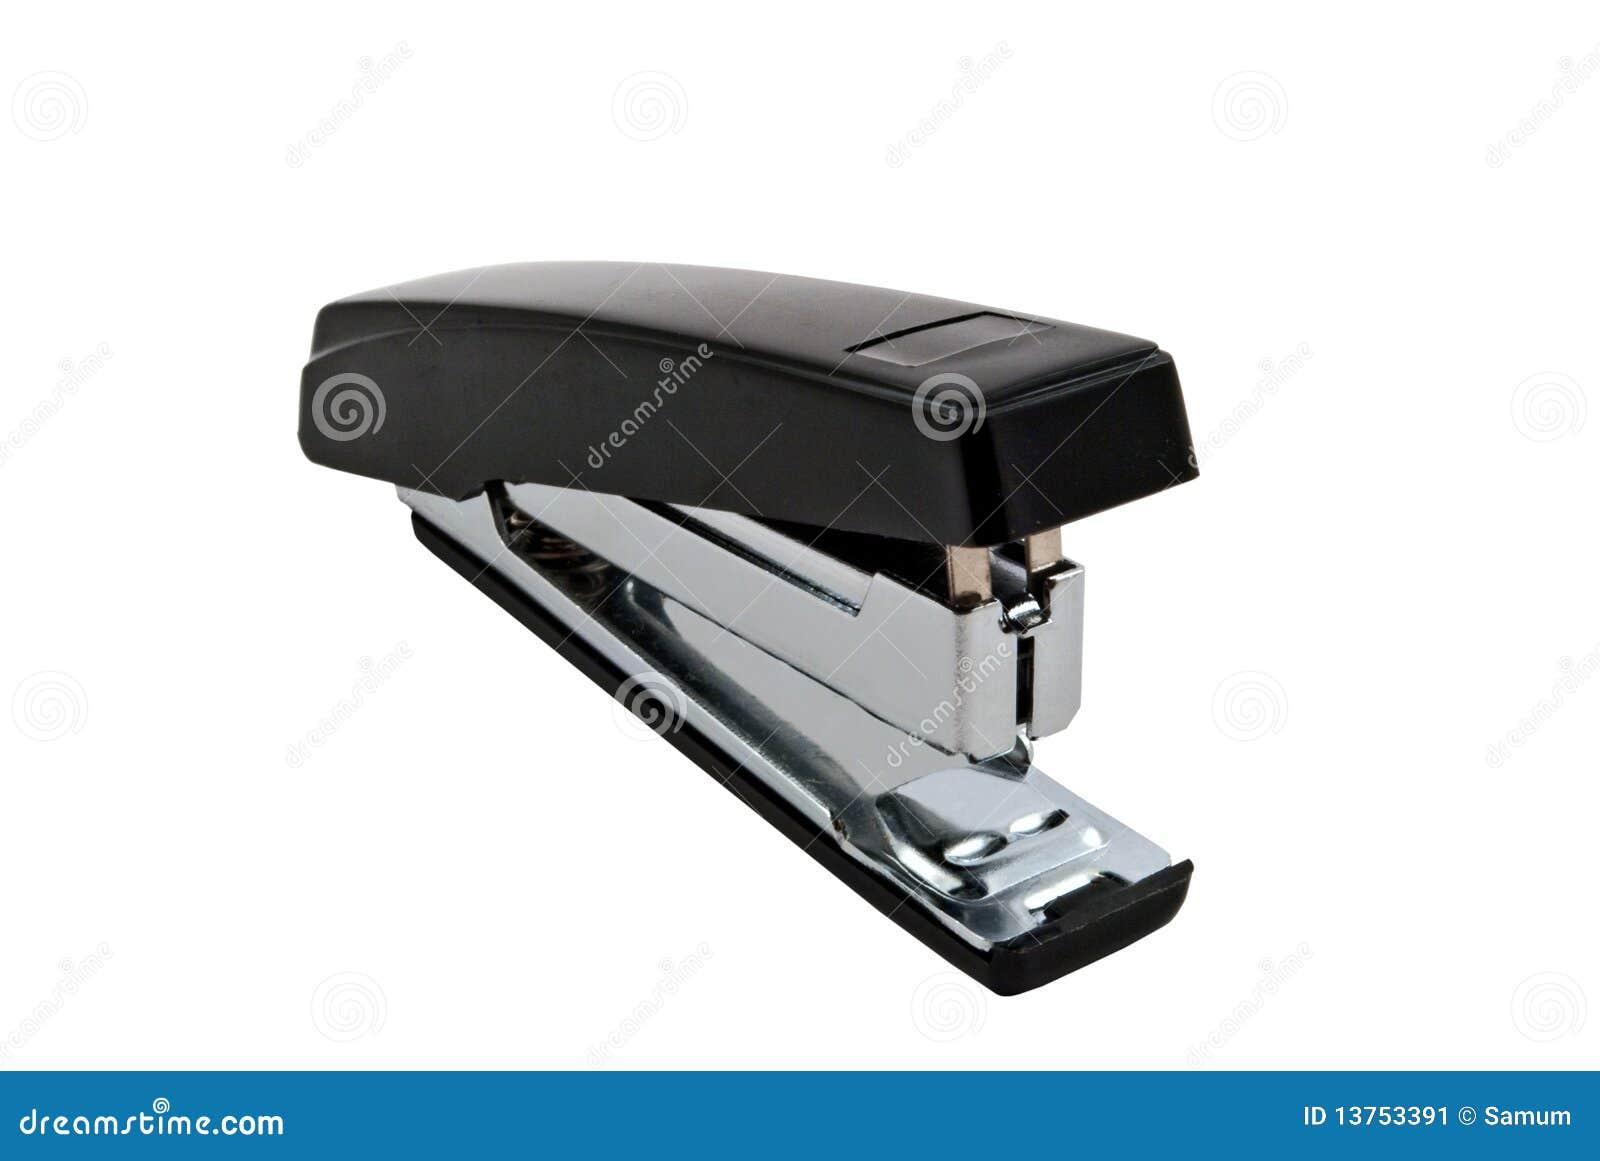 Office Stepler Stock Image Image 13753391